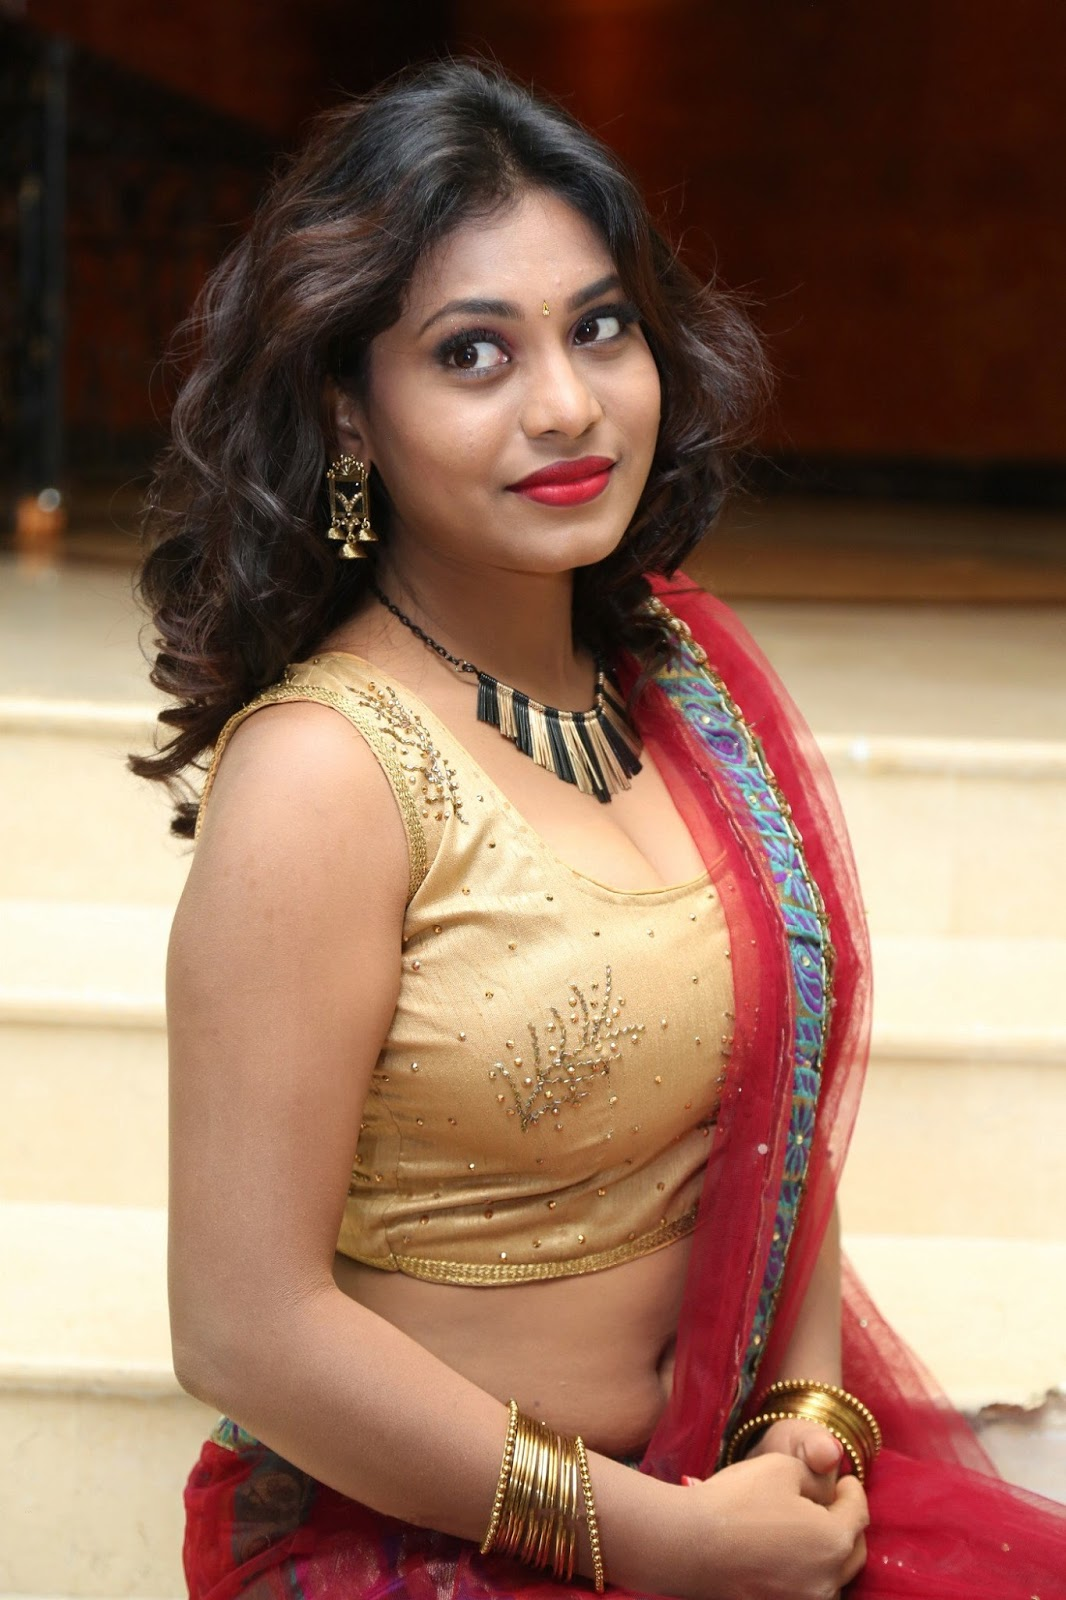 Priya Augustin Looks Stunning in Sleeveless Choli and Red Saree